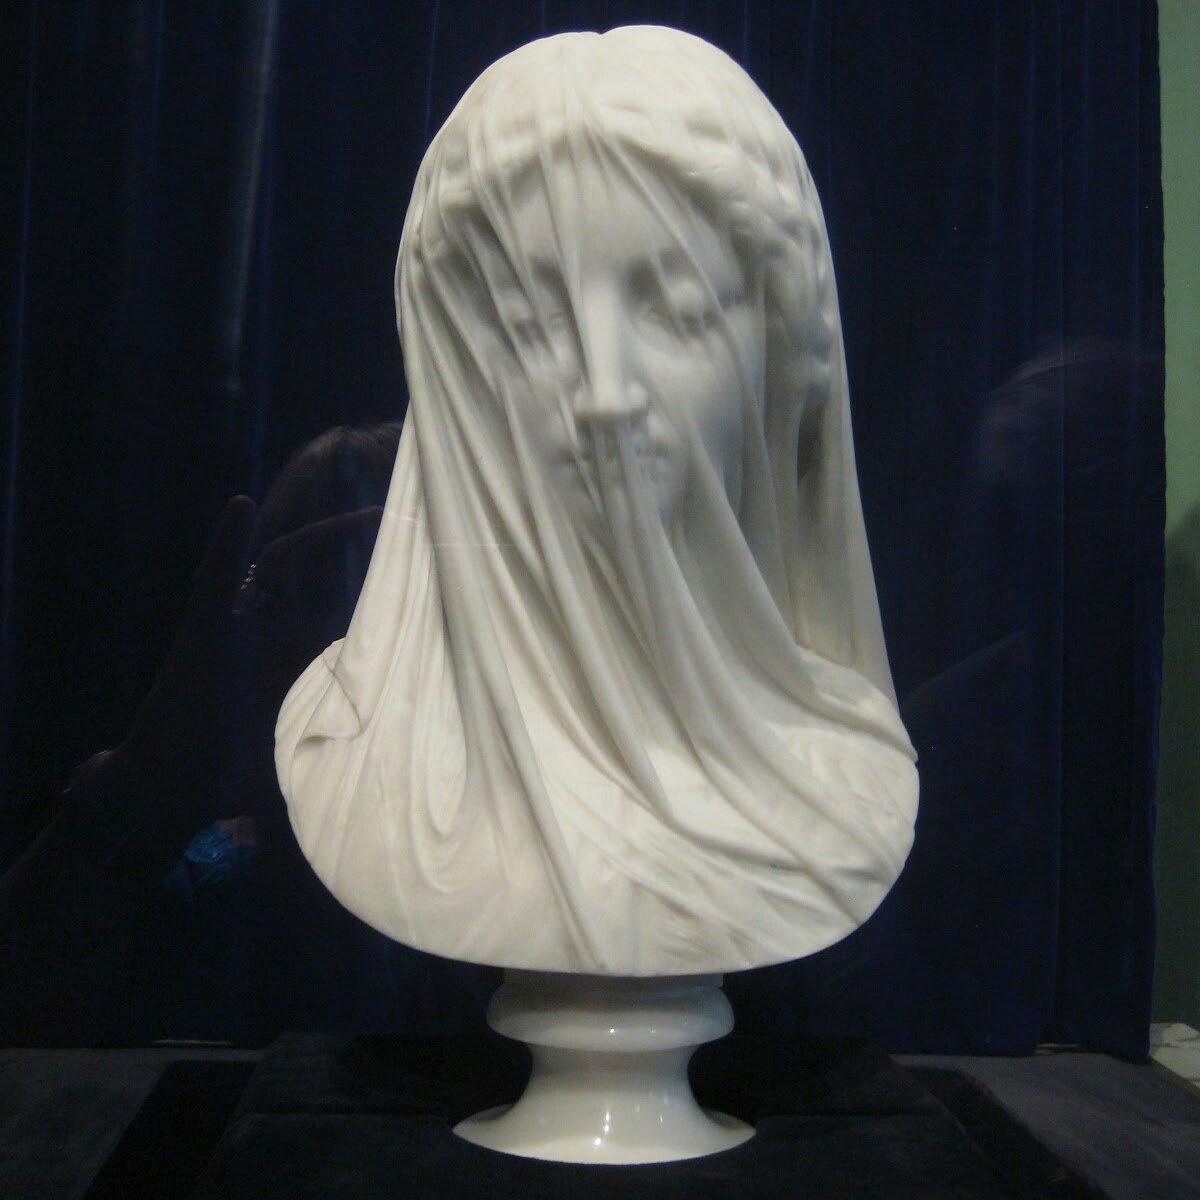 RT @Maeterlinck: Un velo de mármol imposible salvo para Bernini  RT @drlangtry_girl https://t.co/IJSEZ7IbrZ